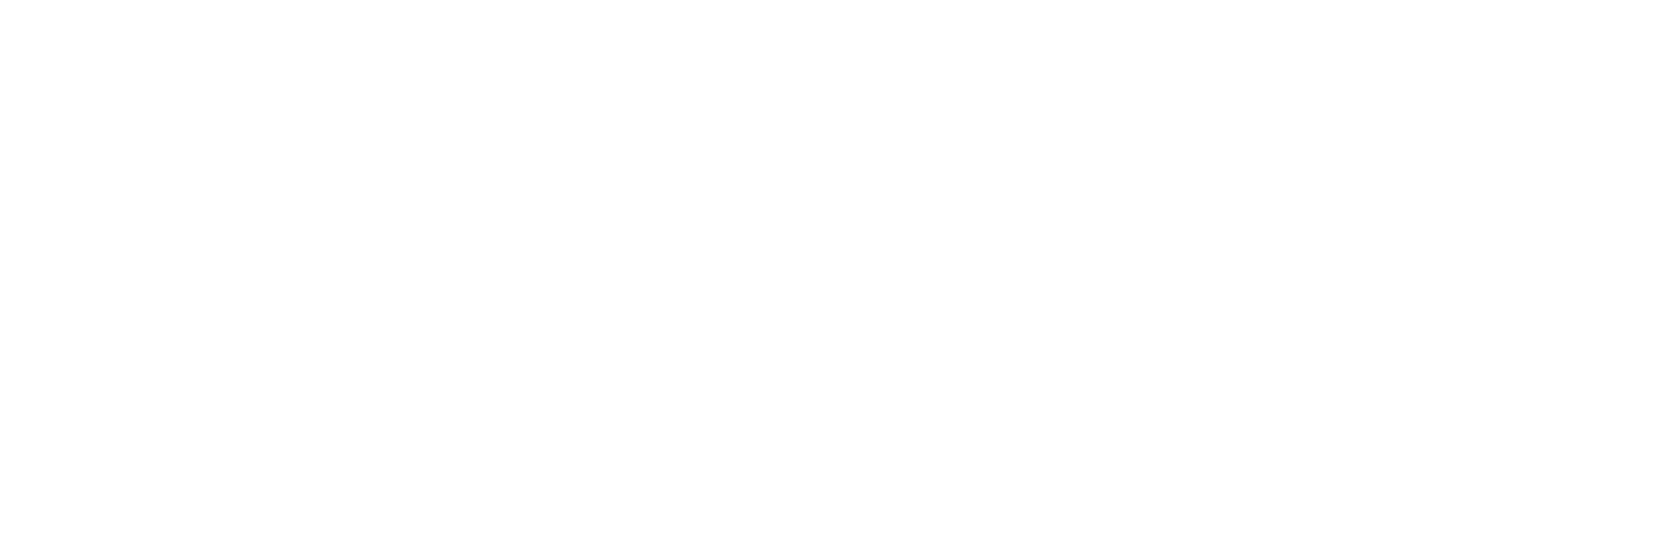 Emera Utility Services